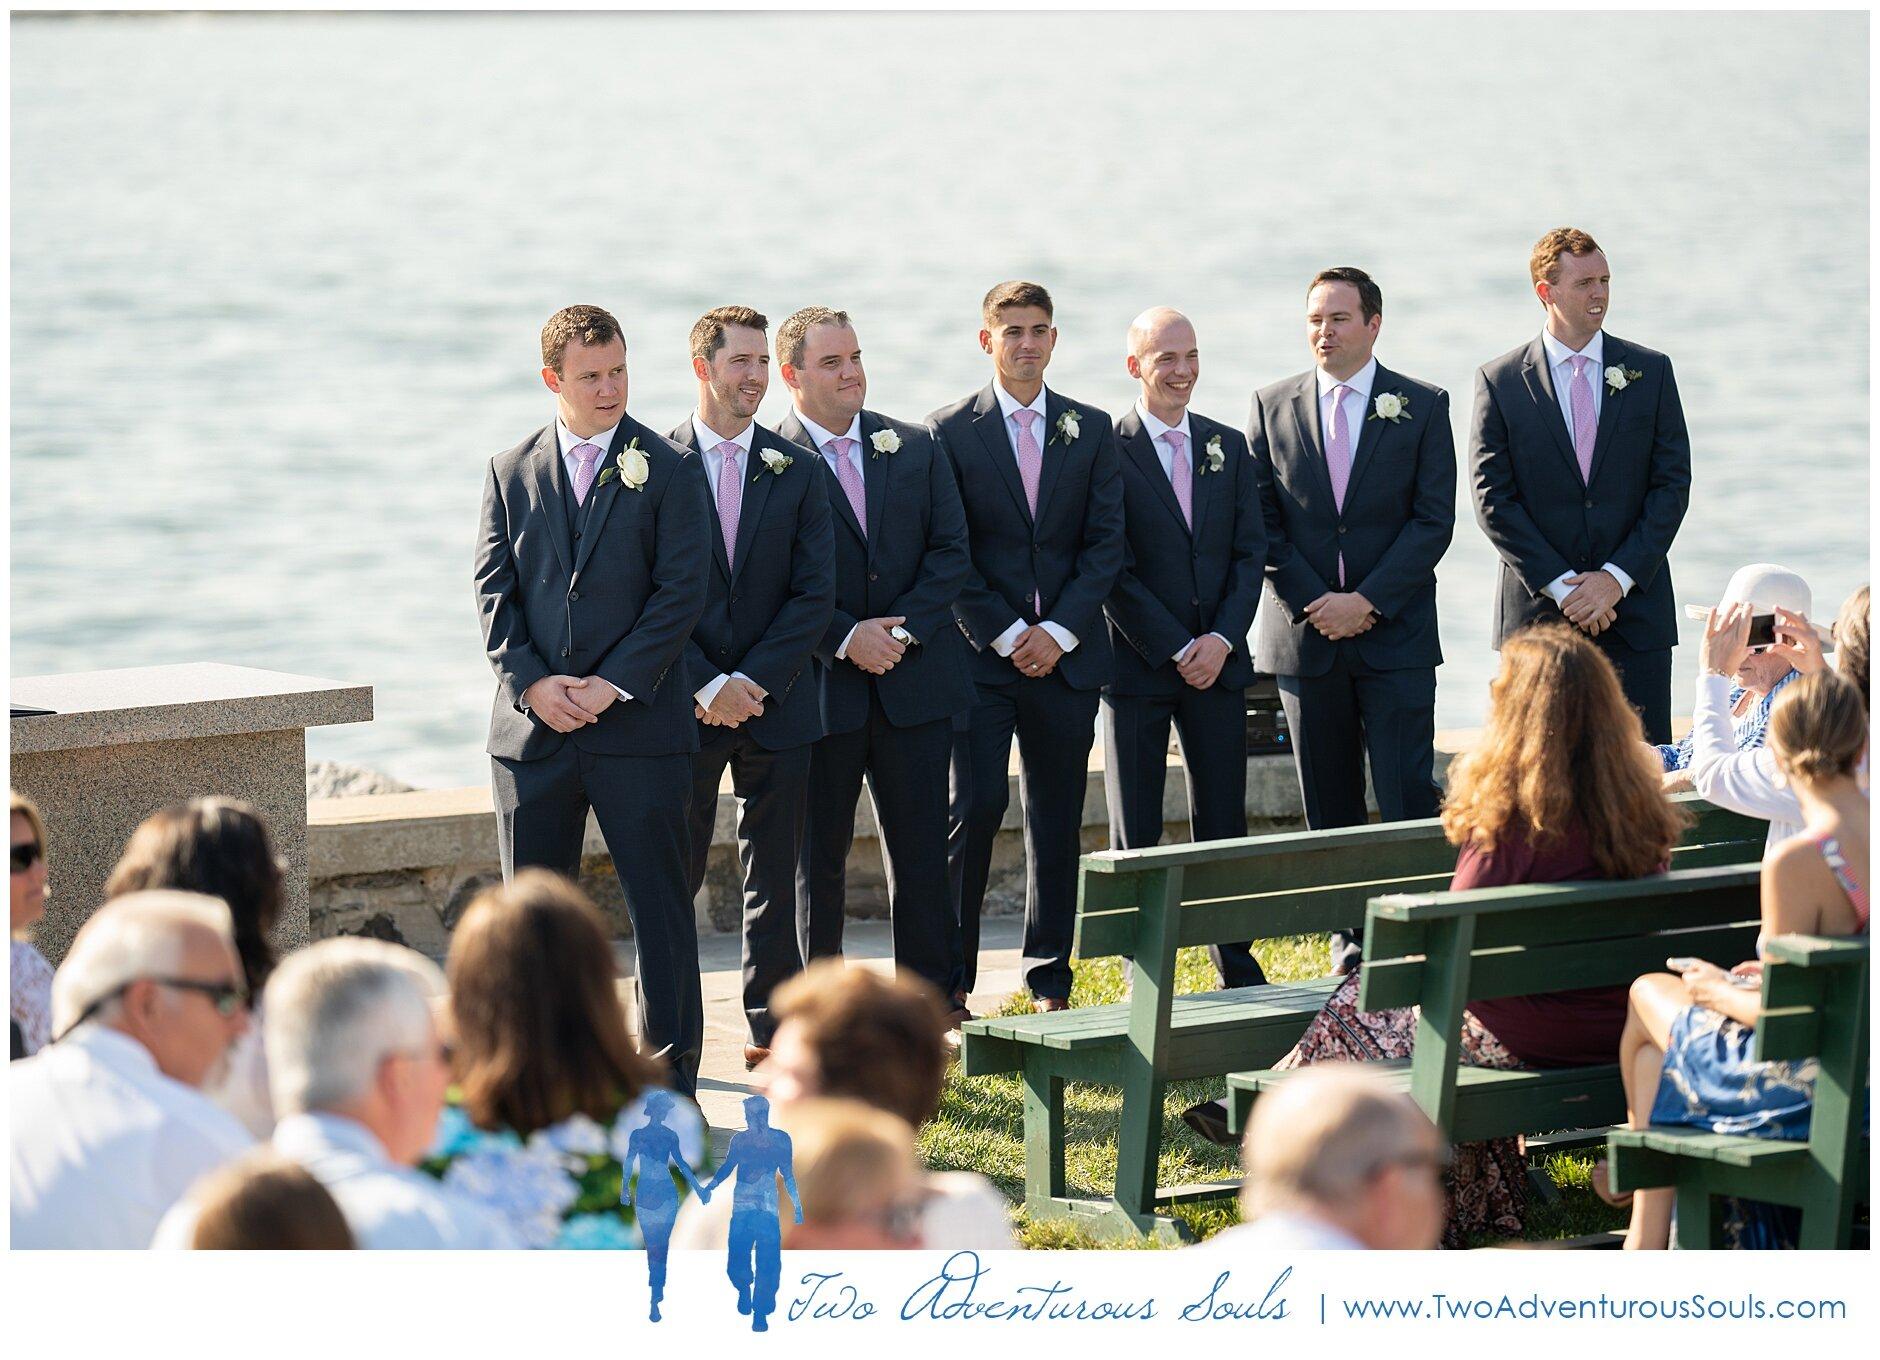 Breakwater Inn and Spa Wedding Photographers, Kennebunkport Wedding Photographers, Two Adventurous Souls- 092119_0029.jpg